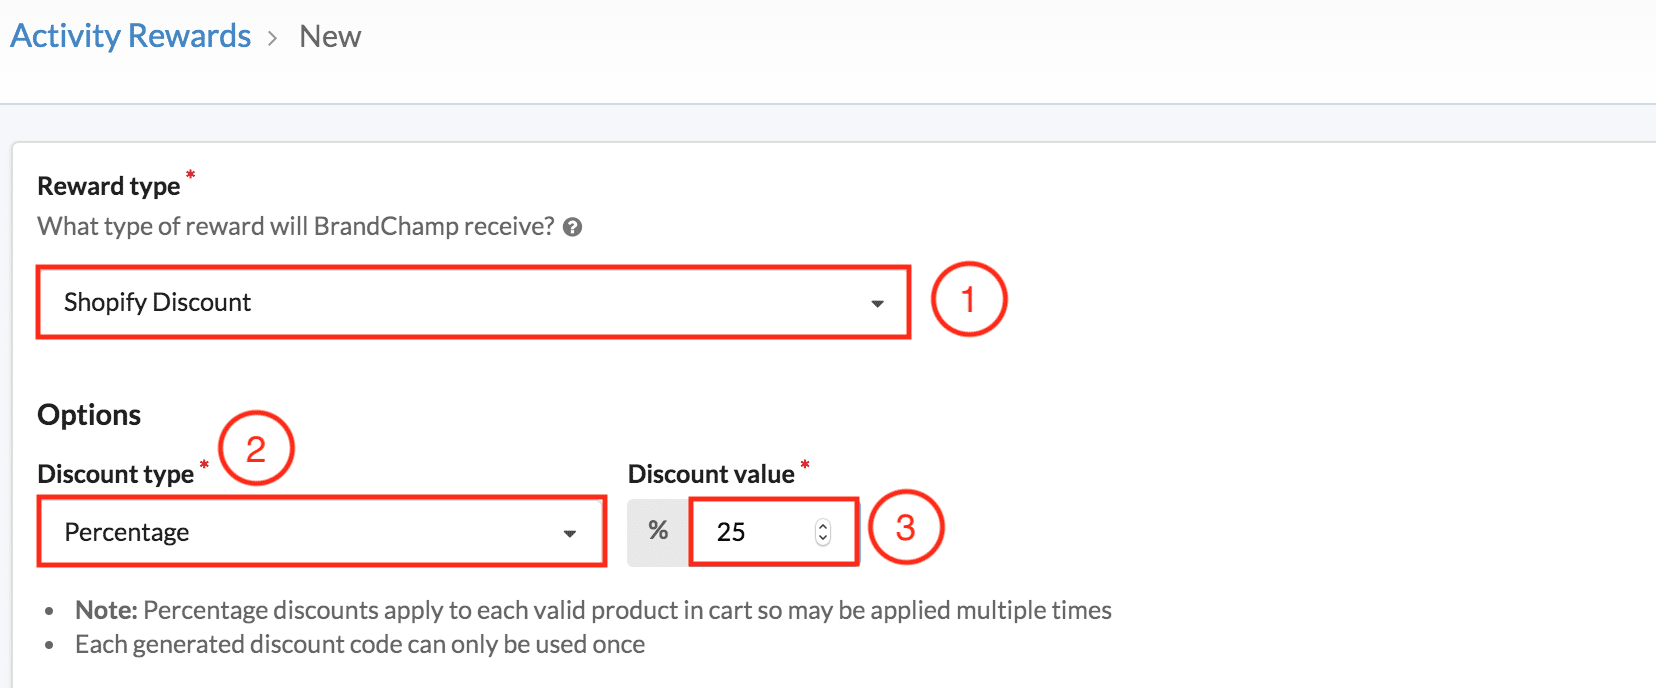 BrandChamp interface ambassador software reward types Shopify discount percentage discount